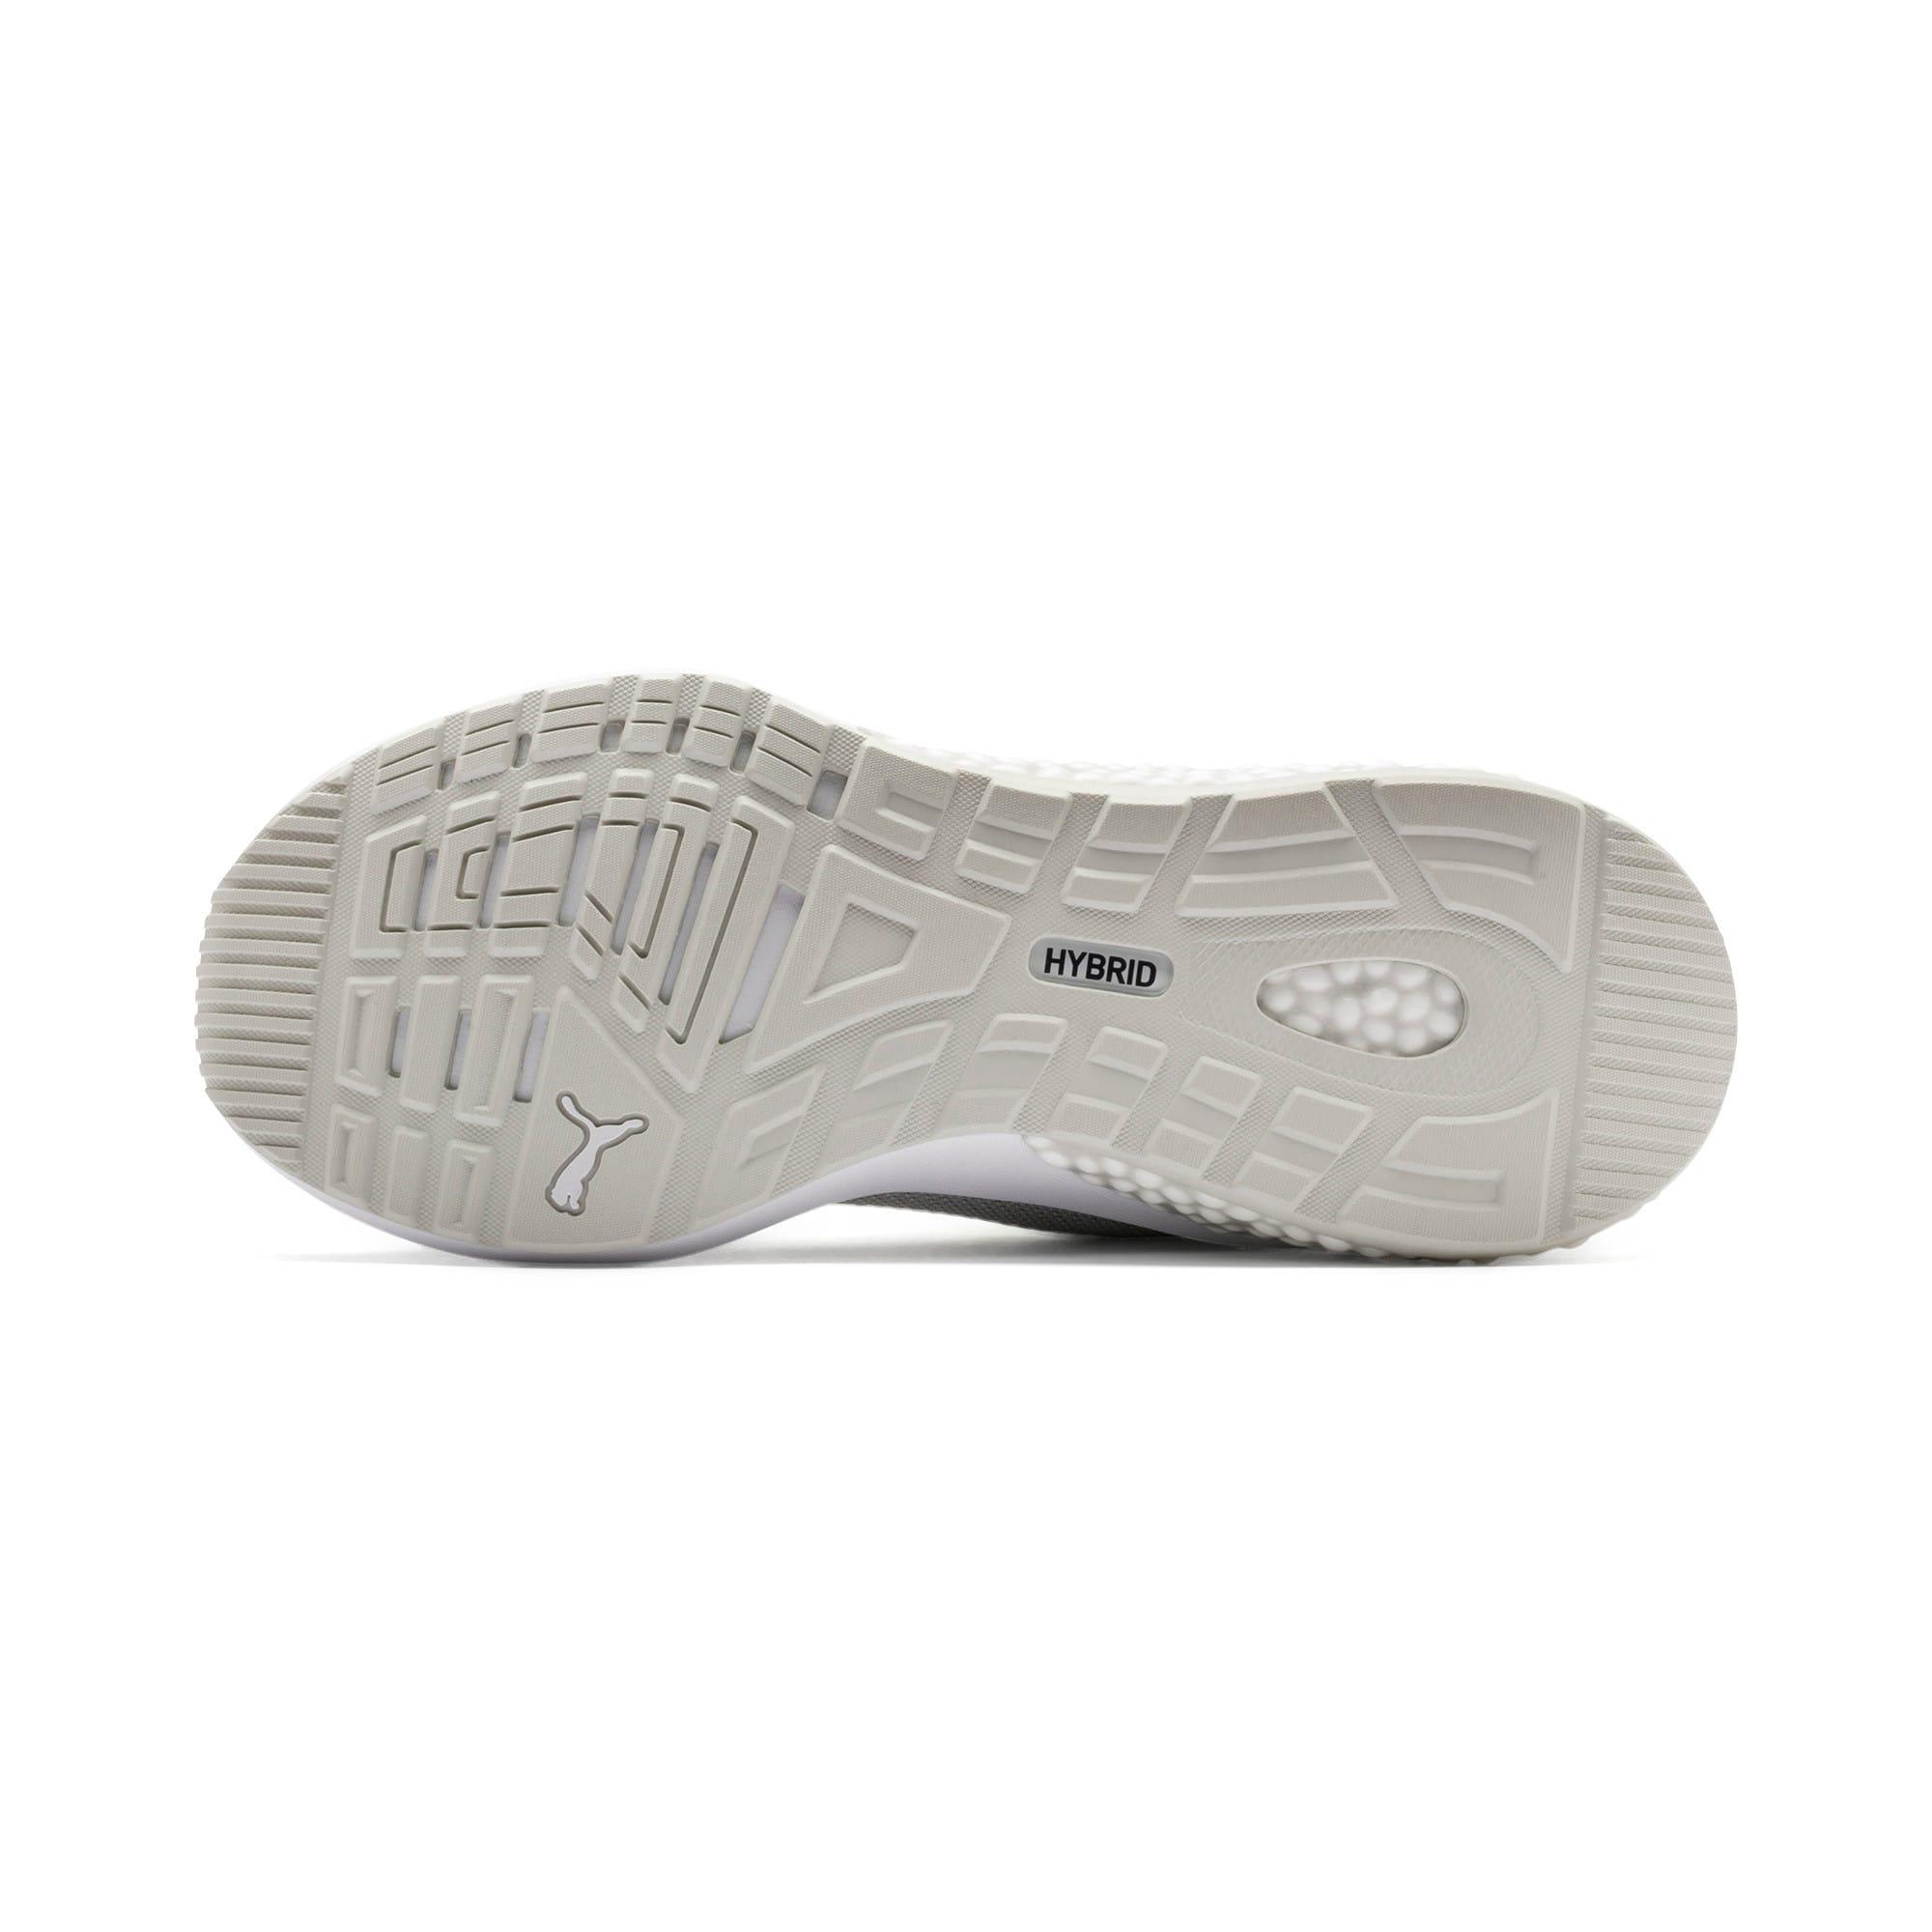 Thumbnail 5 of HYBRID NX Women's Running Shoes, Puma White-Pink Alert, medium